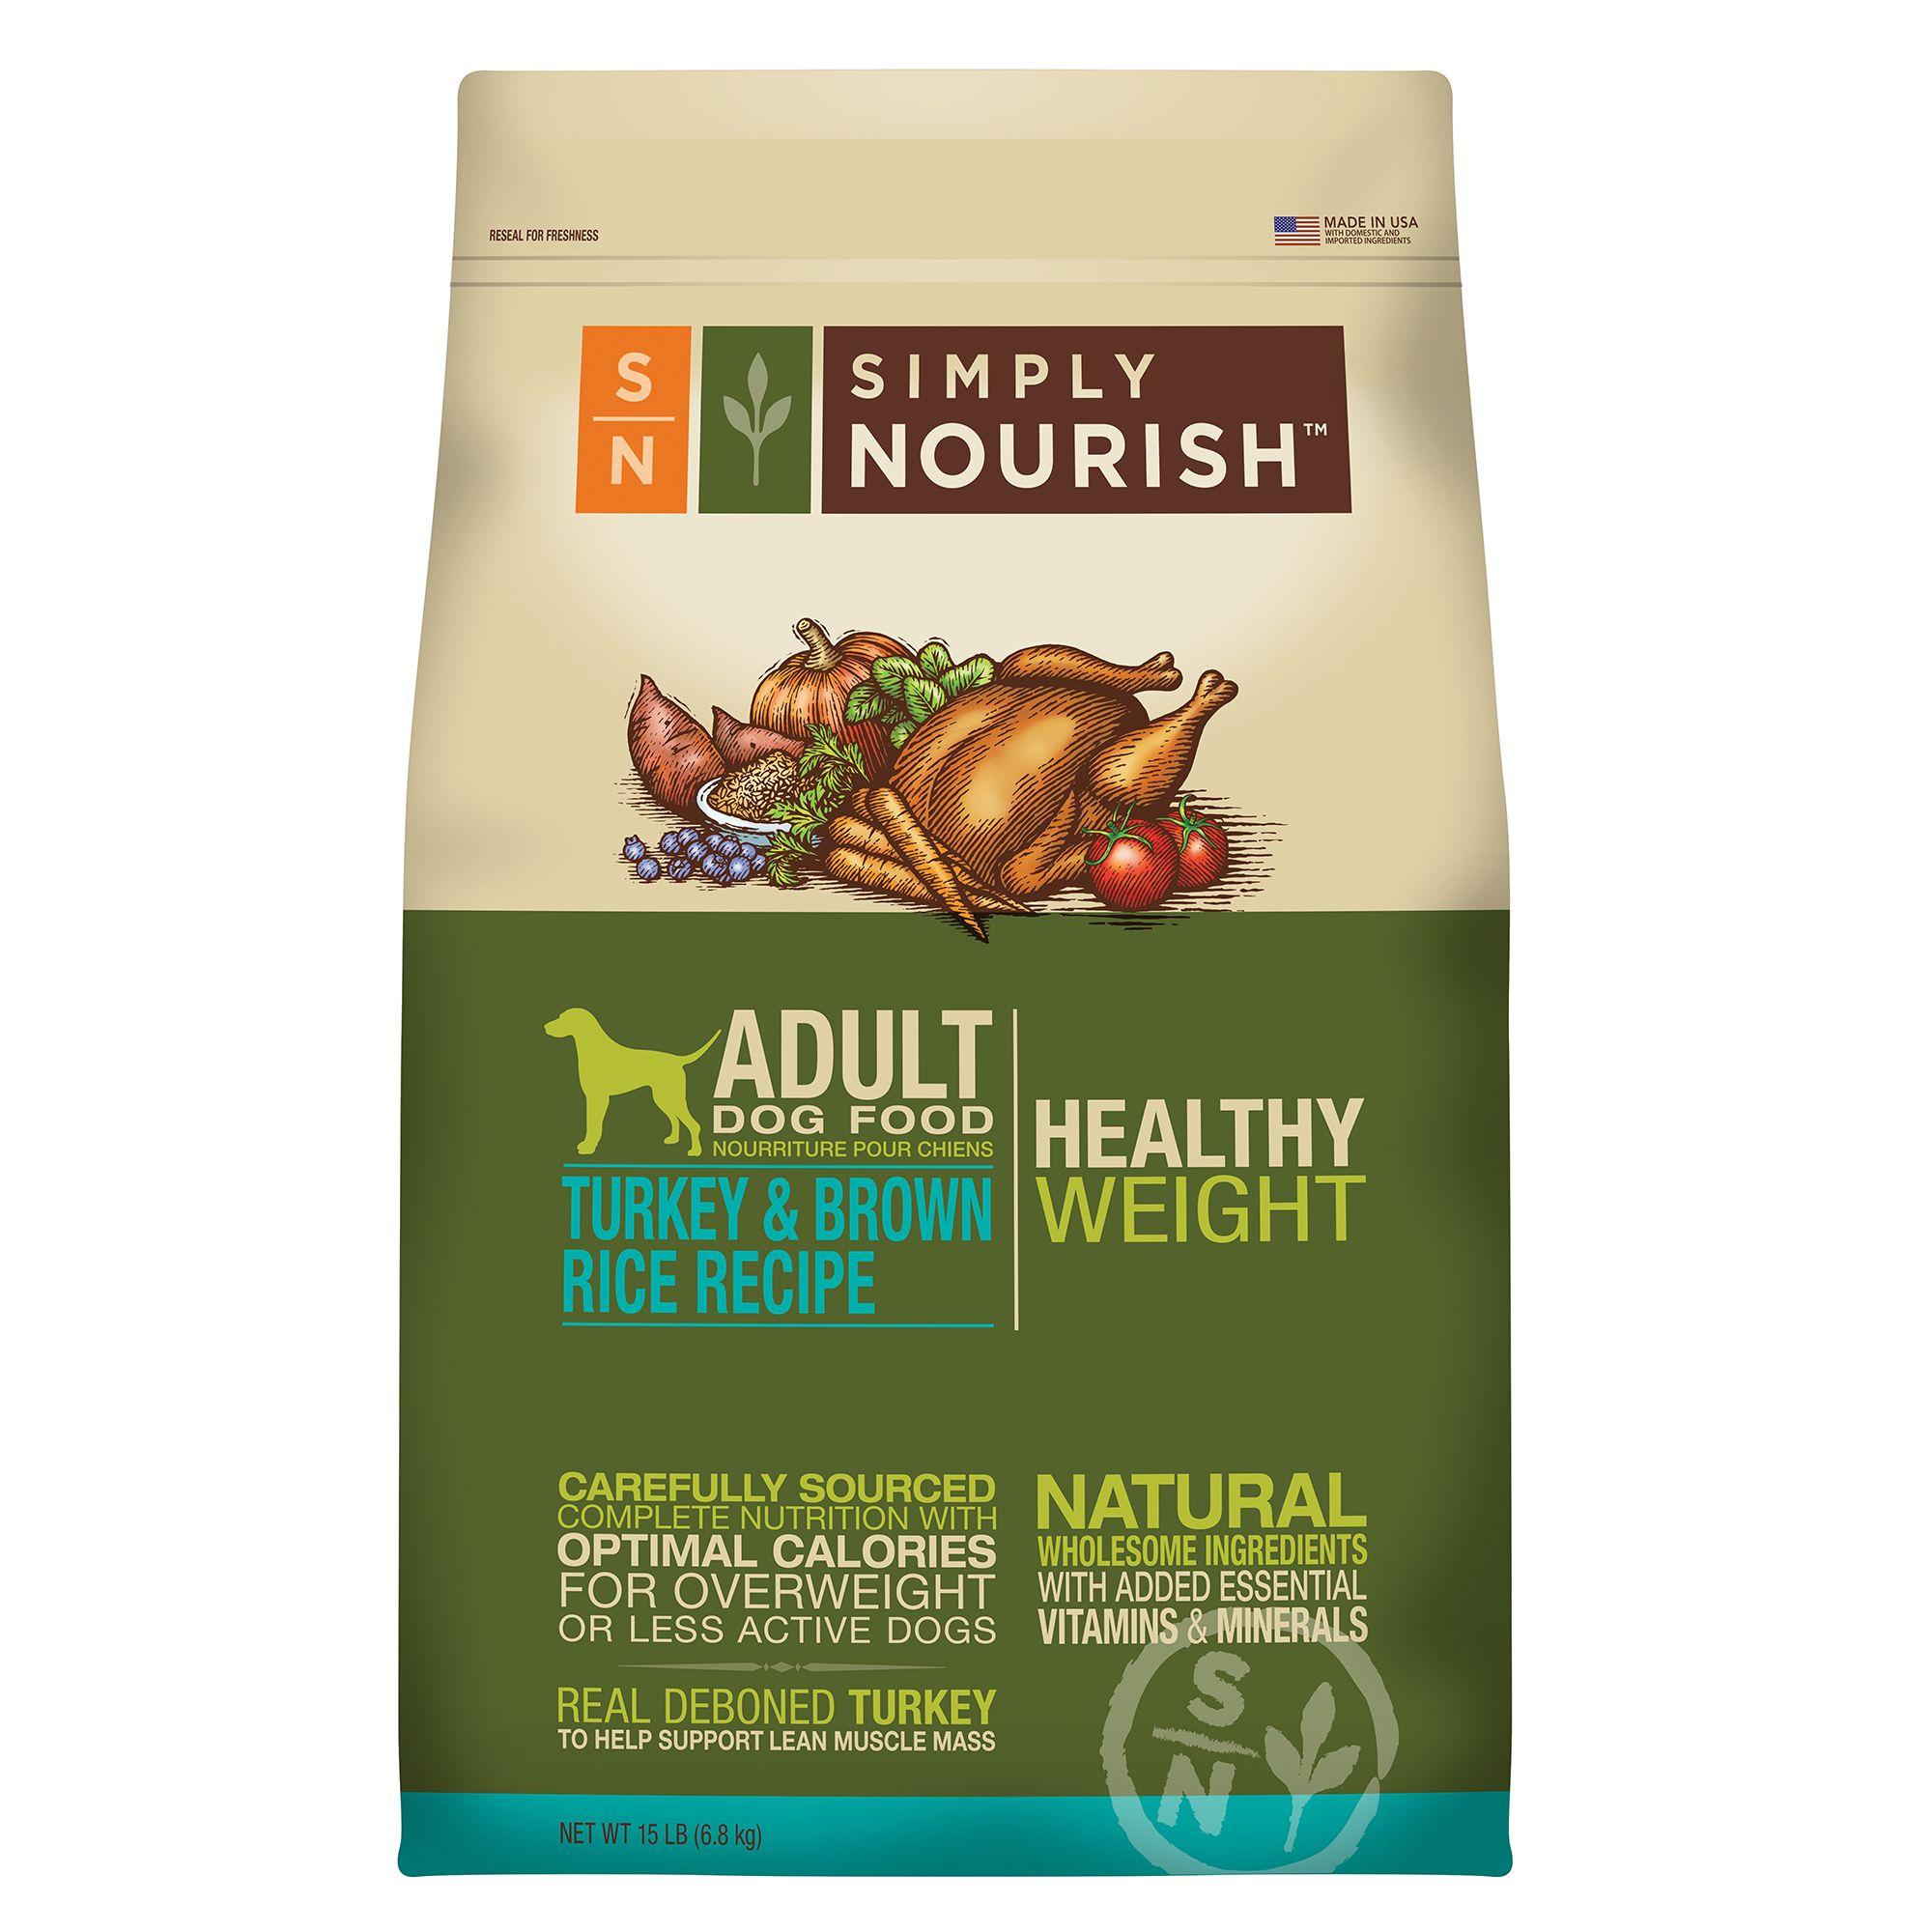 Who Makes Simply Nourish Dog Food